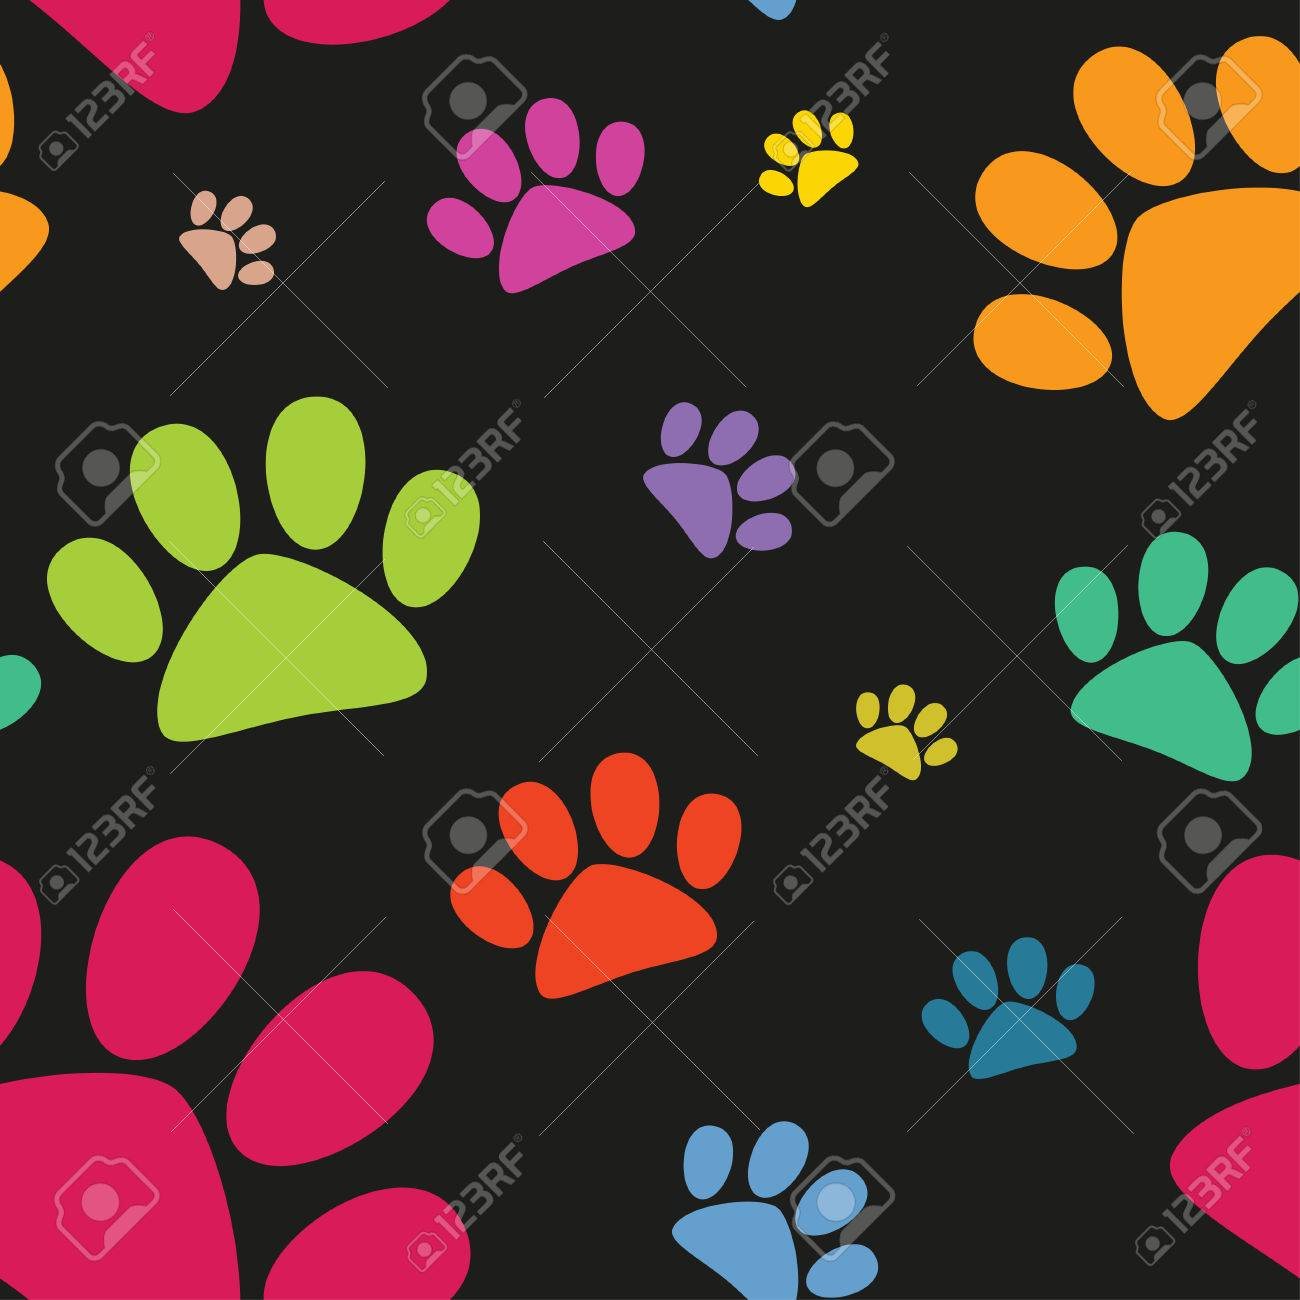 Funny animal footprint seamless pattern - 30067994